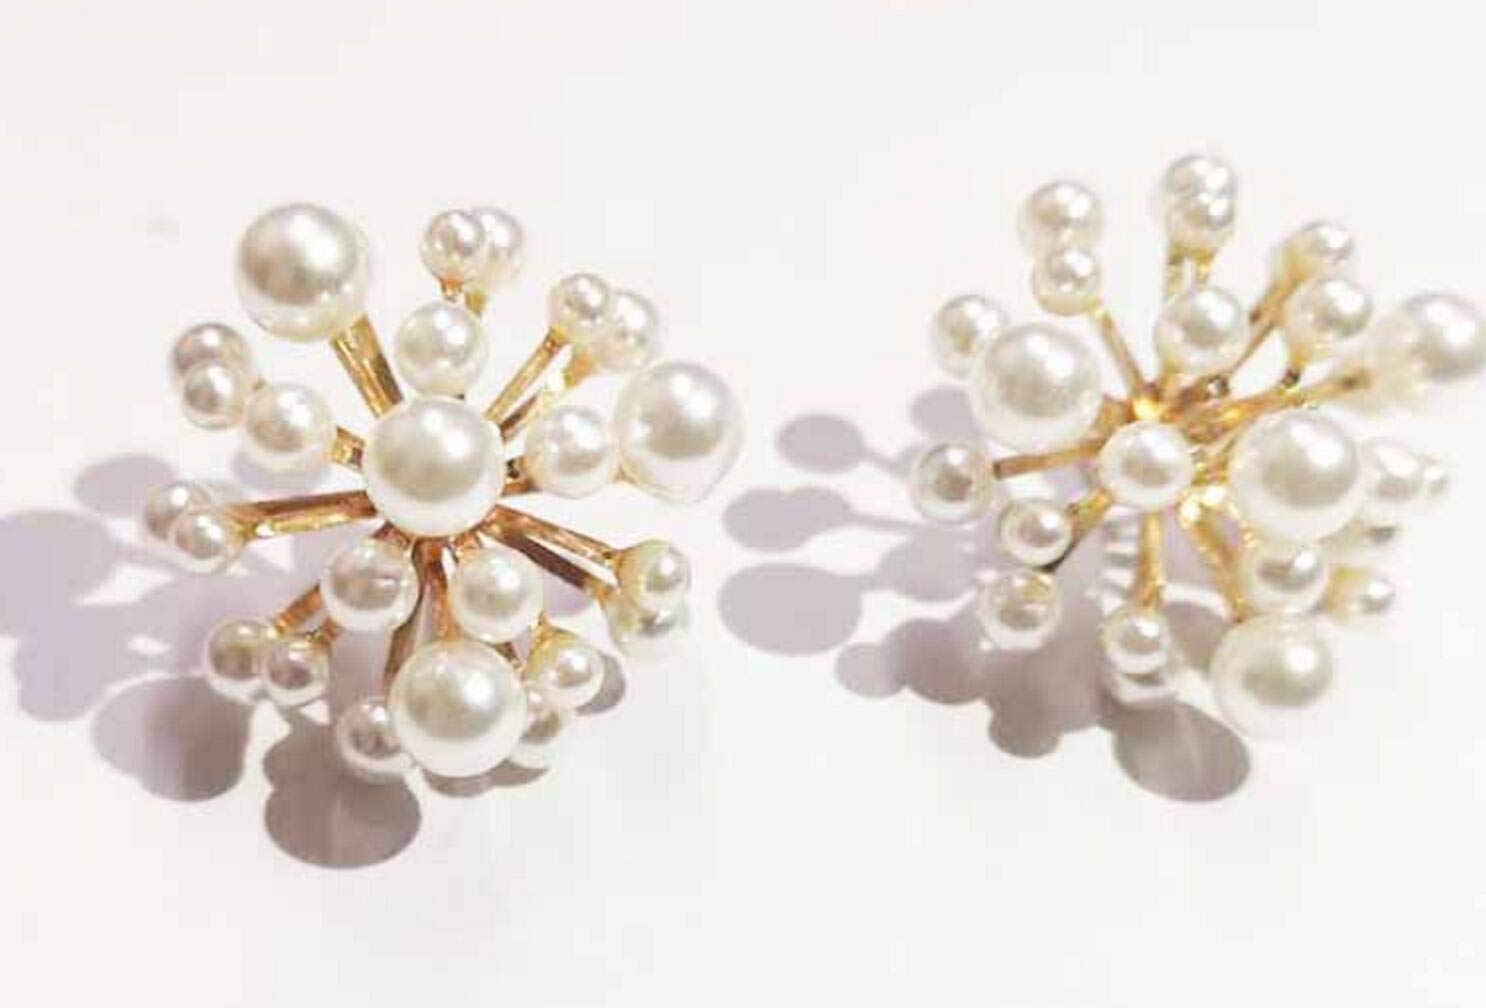 925 Silver Needle Beautiful Fireworks Pearl Earrings (White)